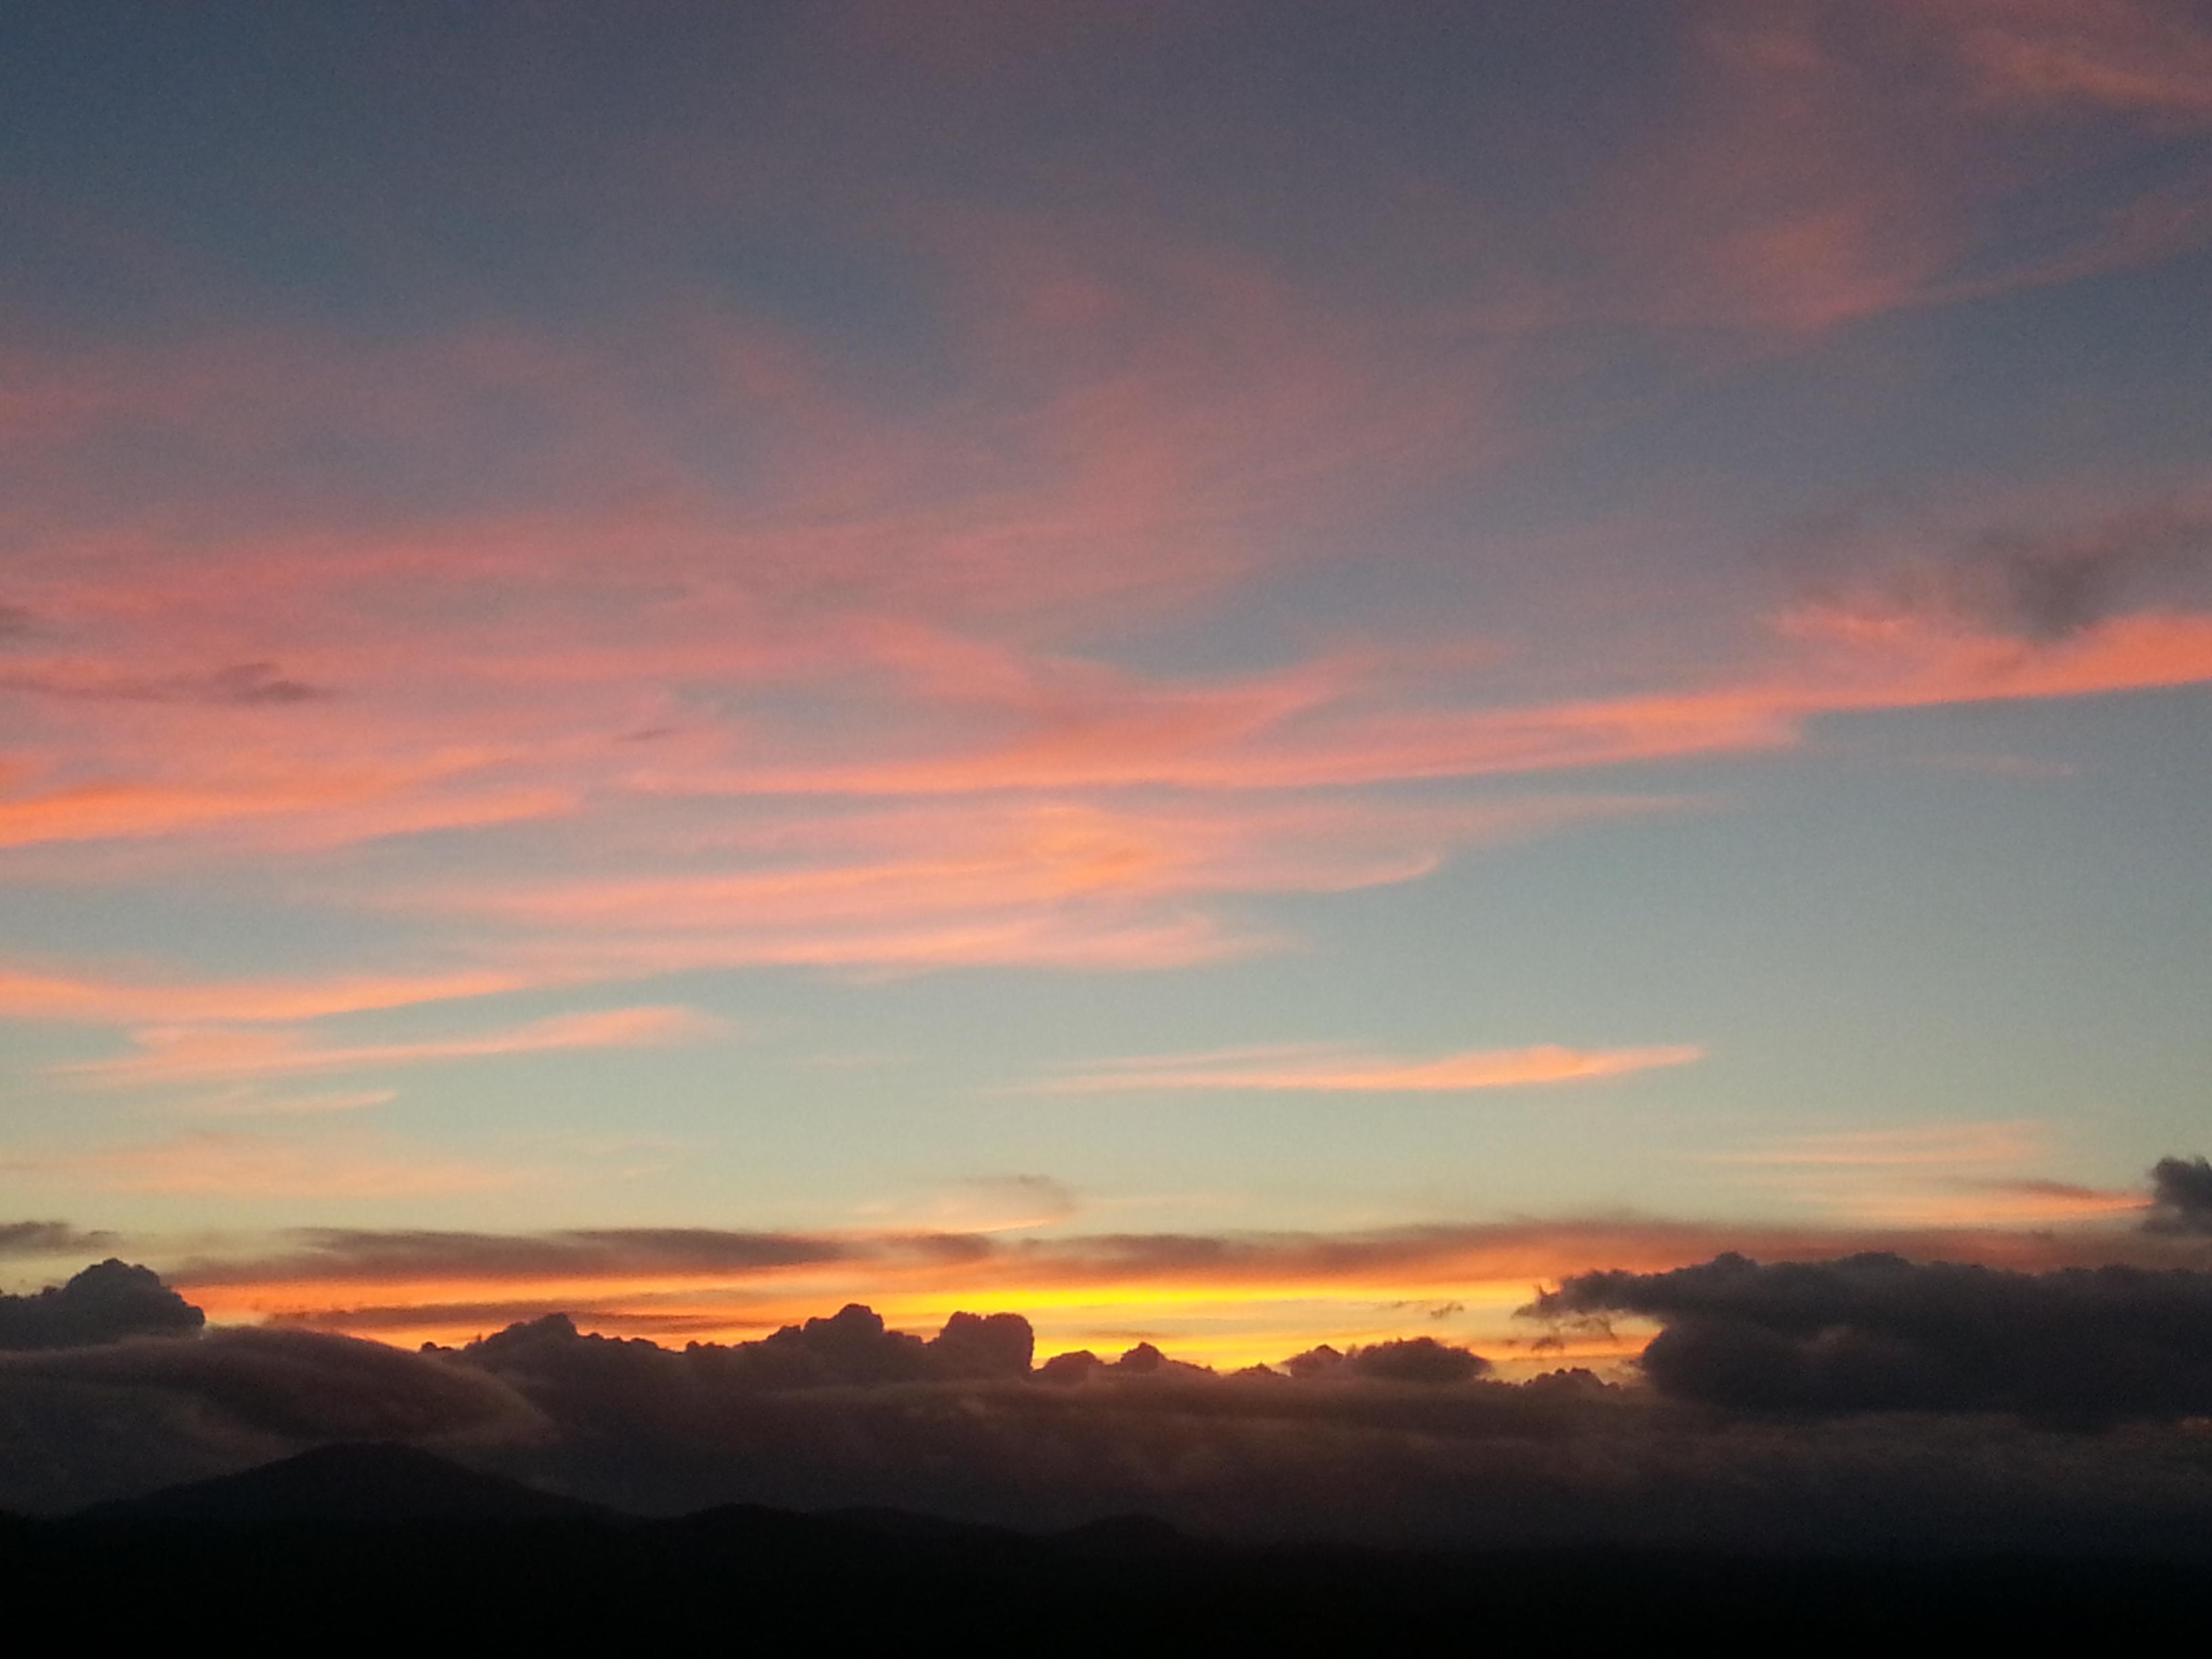 Pink, blue, yellow, orange, gray \u0026 black \u2013 a sky of many moods ...